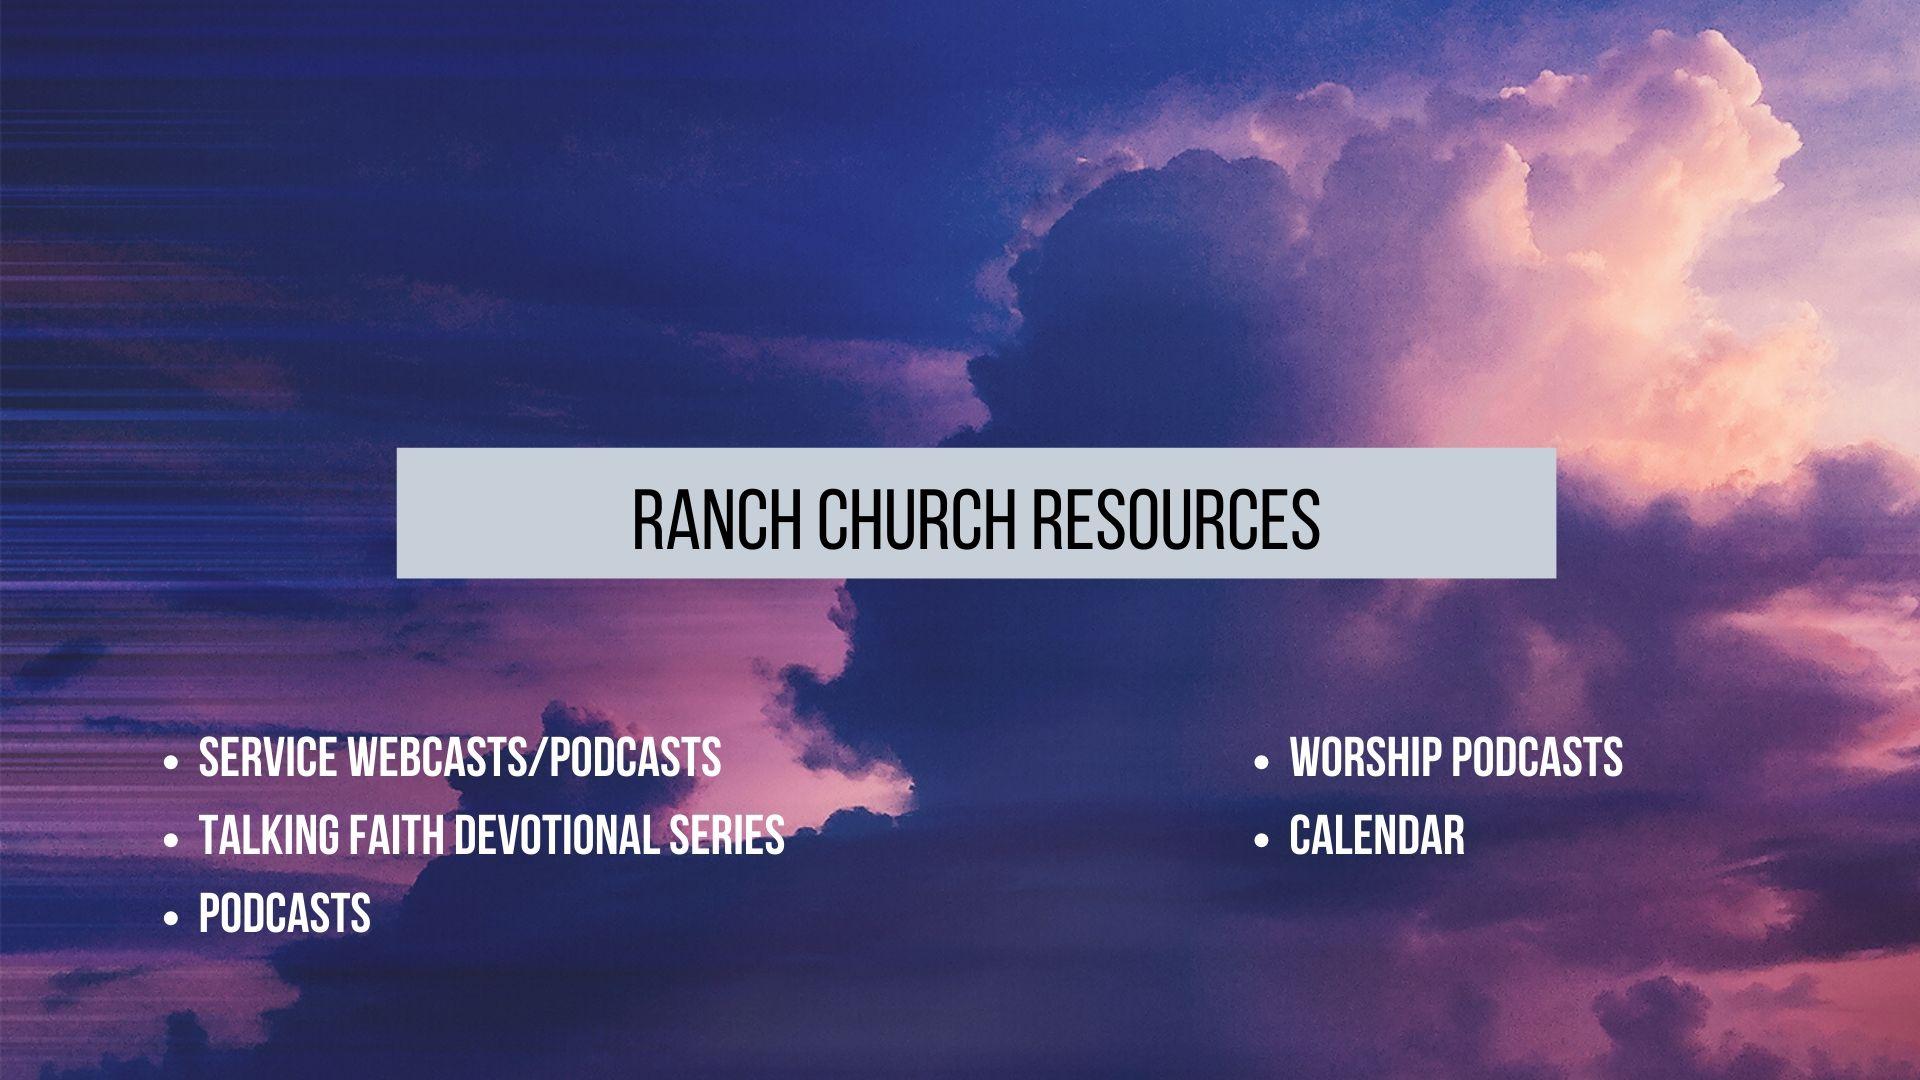 ranch church resources REV 1